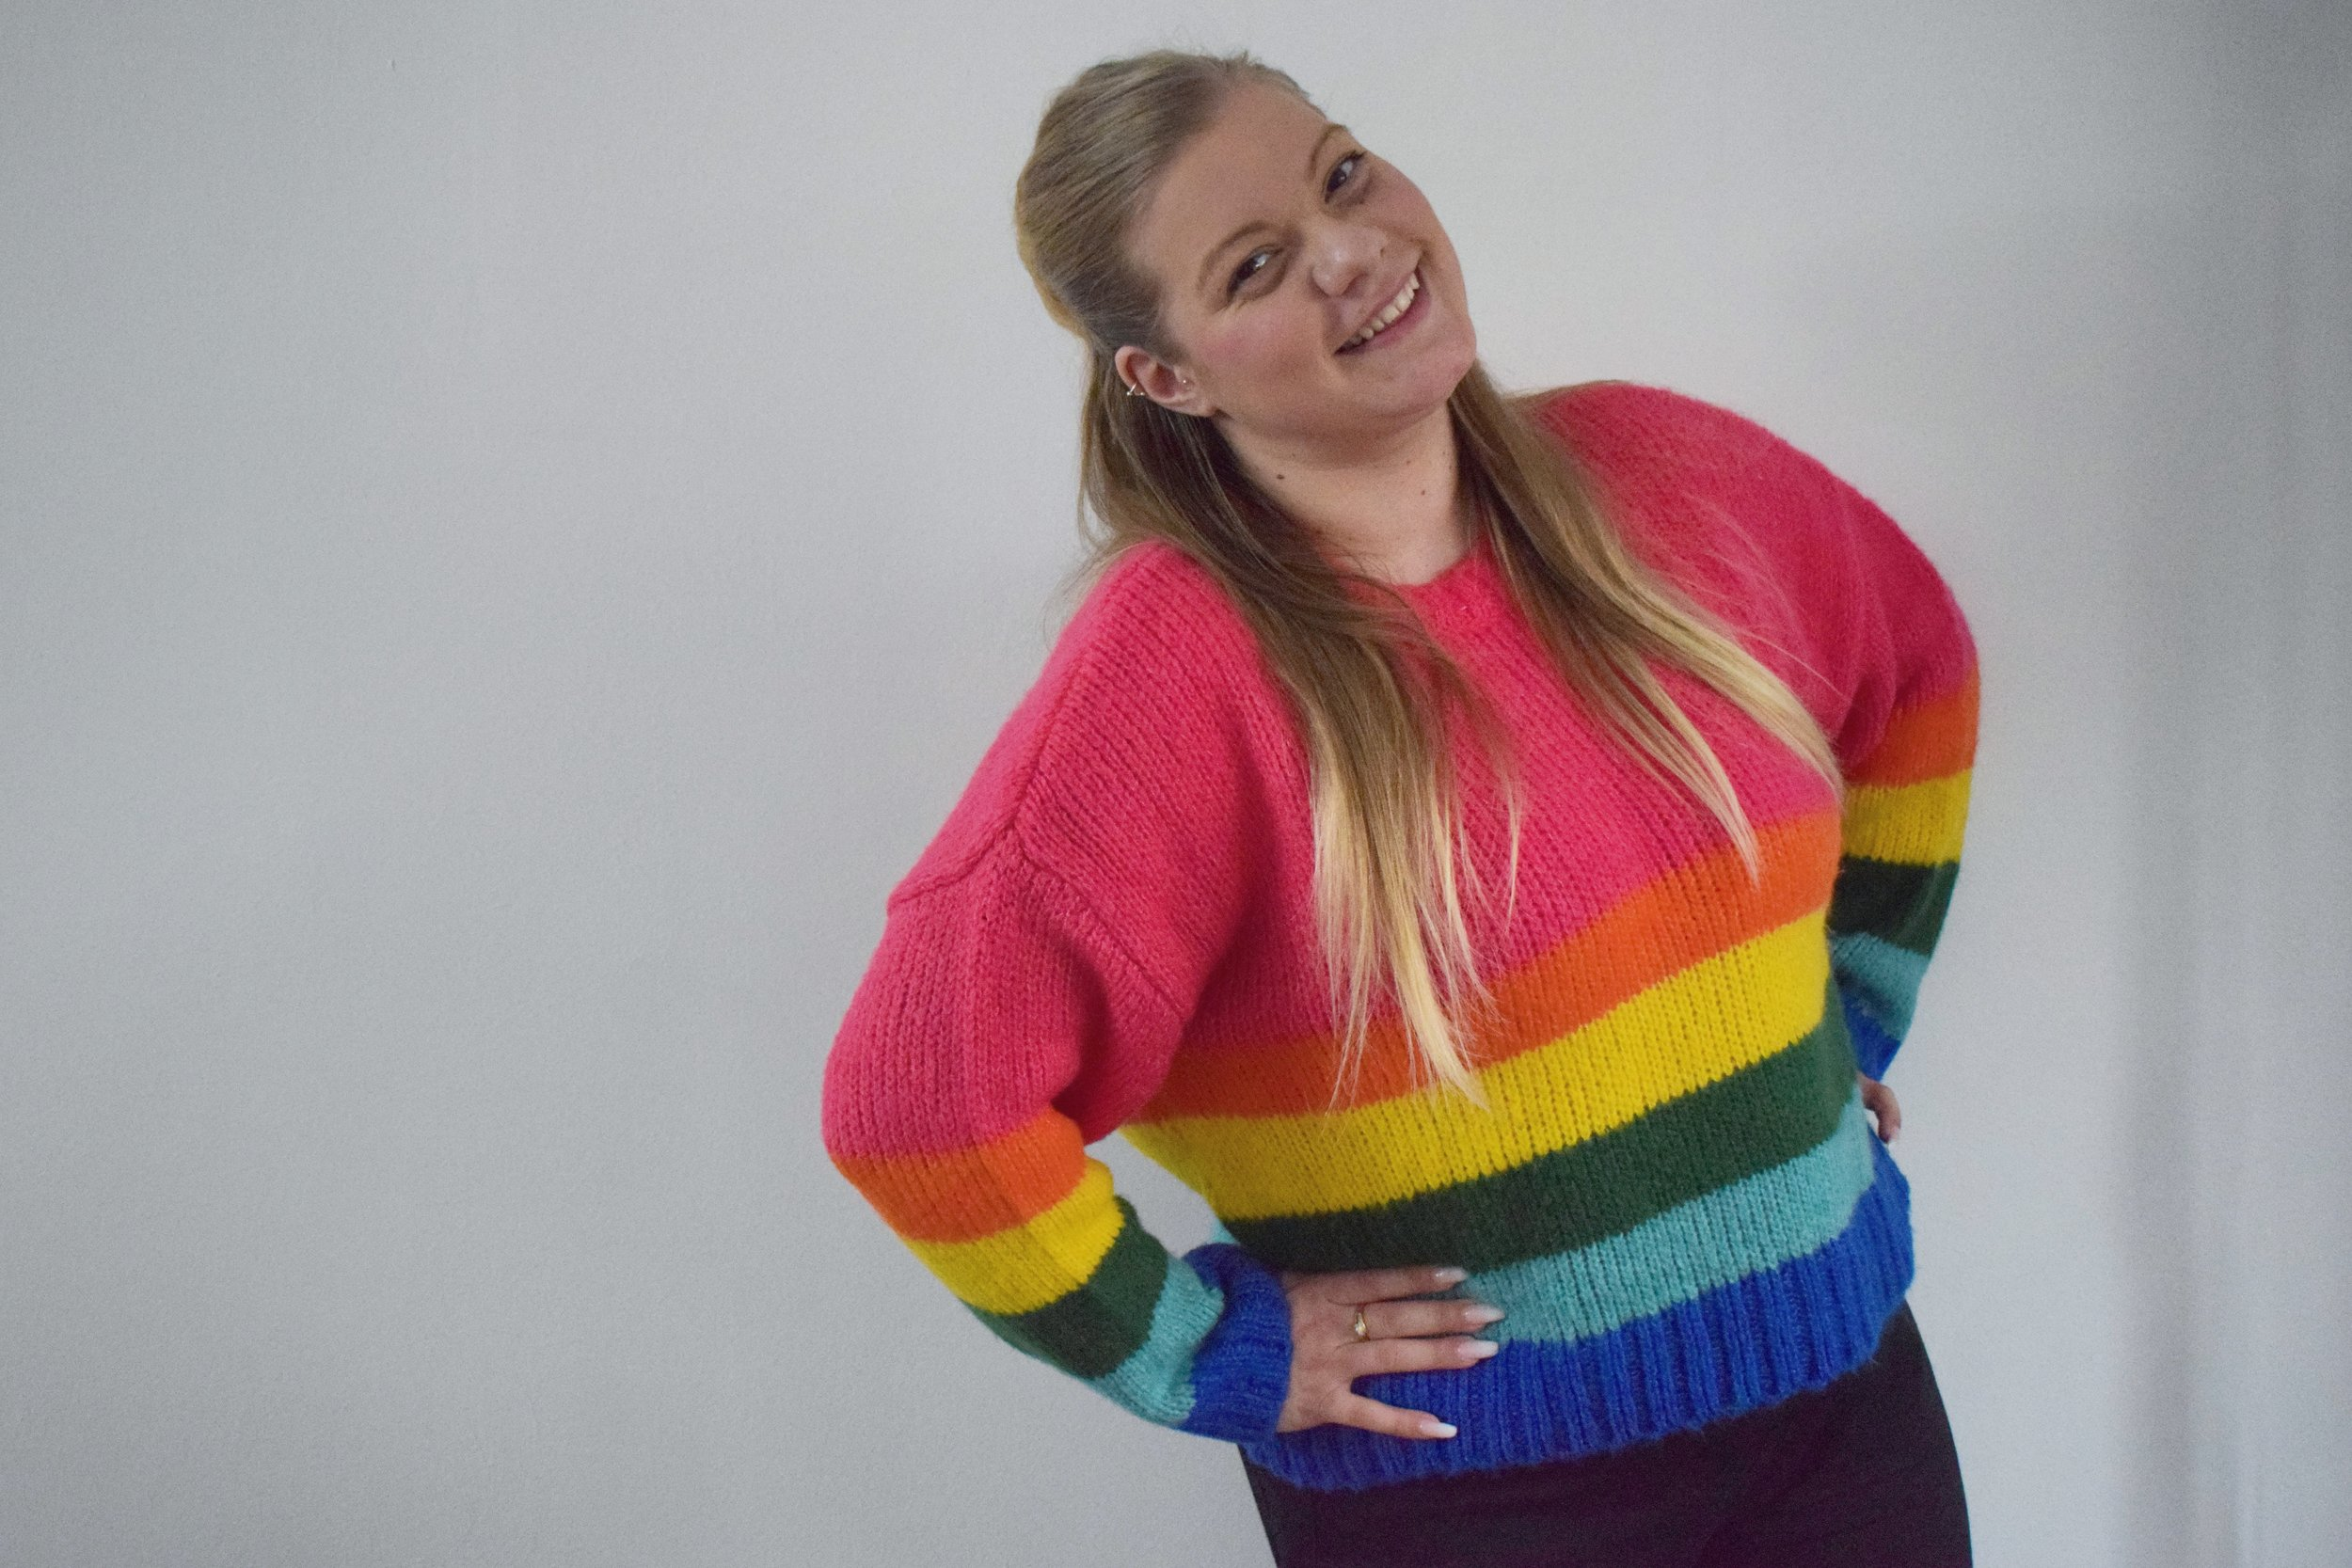 2019 Valentine's Day gifts rainbow jumper from Primark